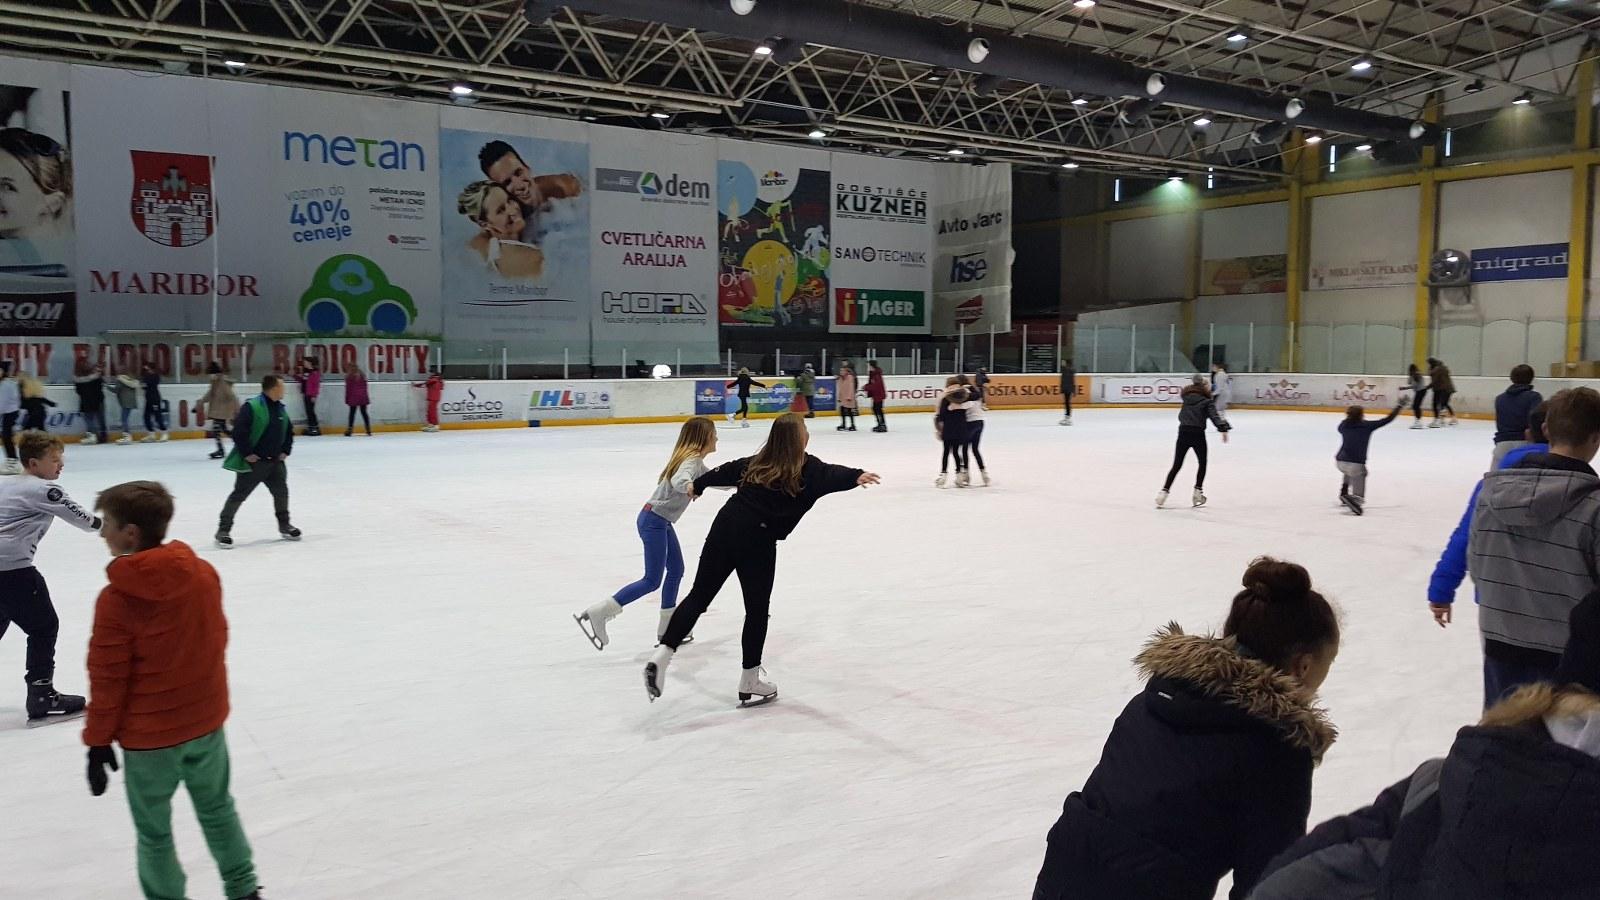 2018_02_05_zimski_sportni_dan_6-9-21